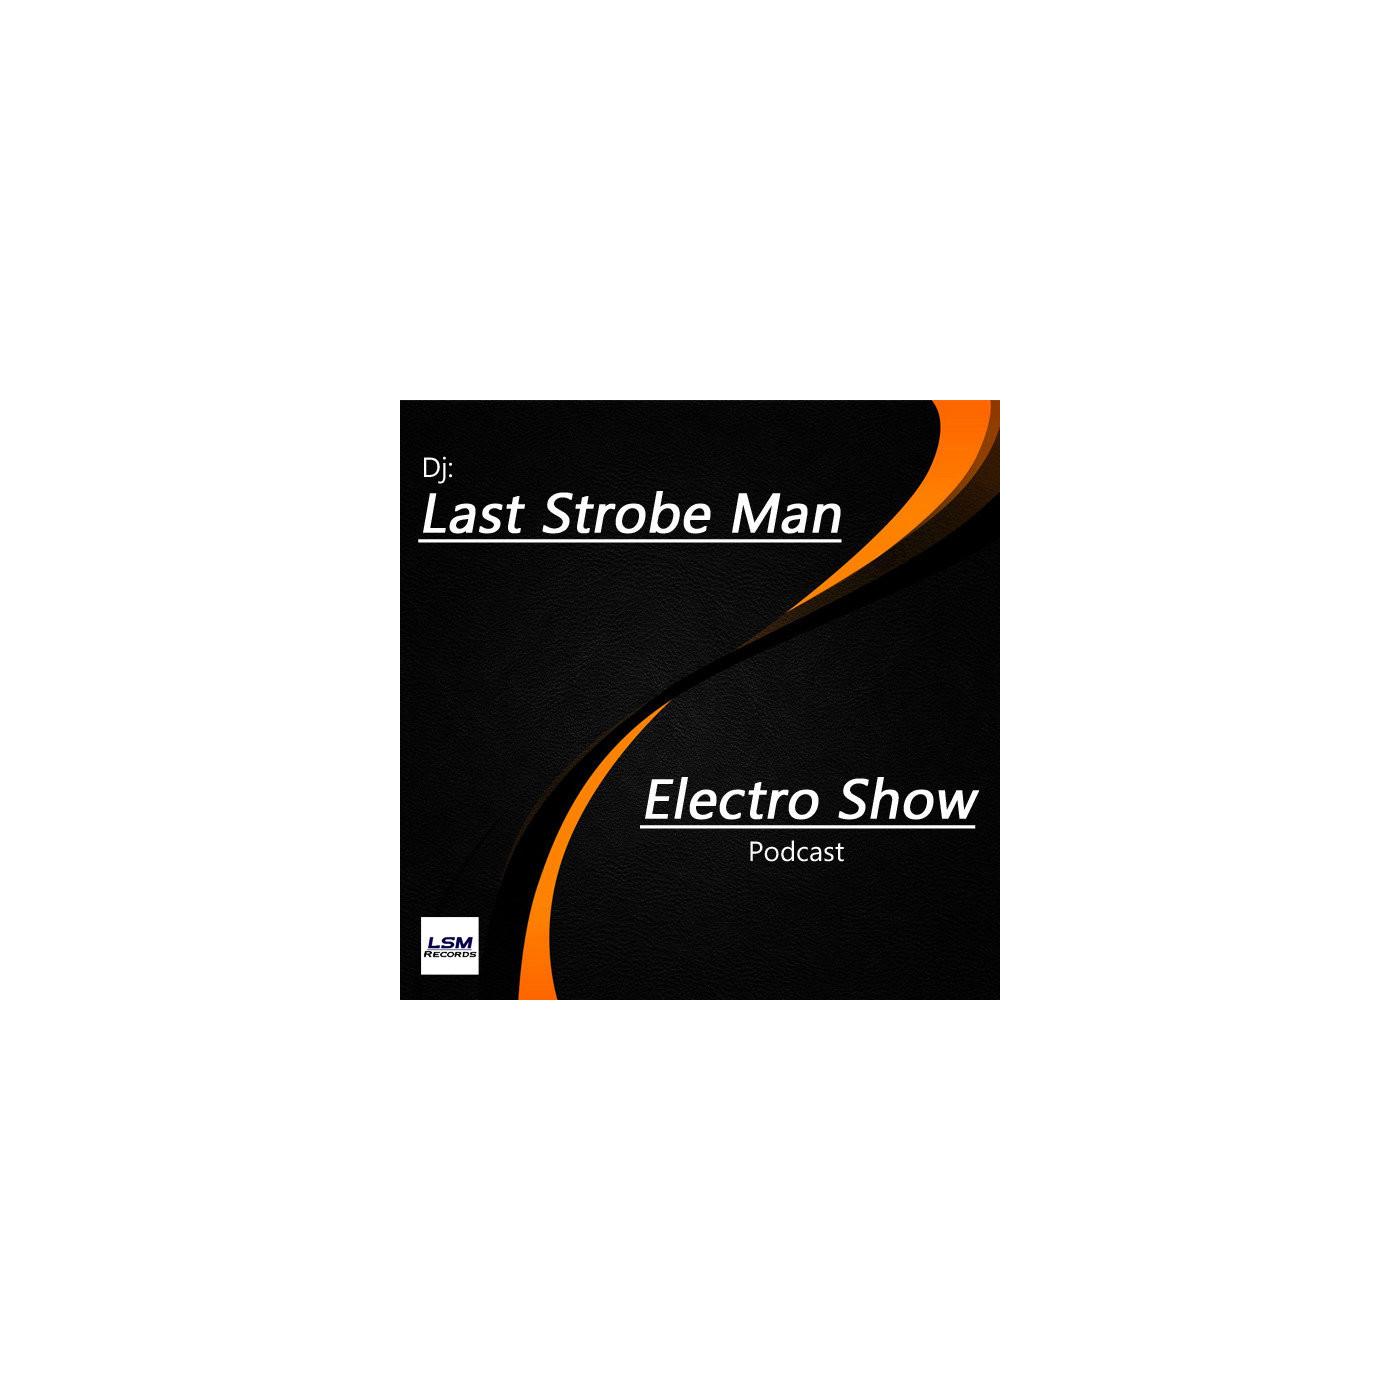 <![CDATA[Last Strobe Man - Electro Show Podcast]]>